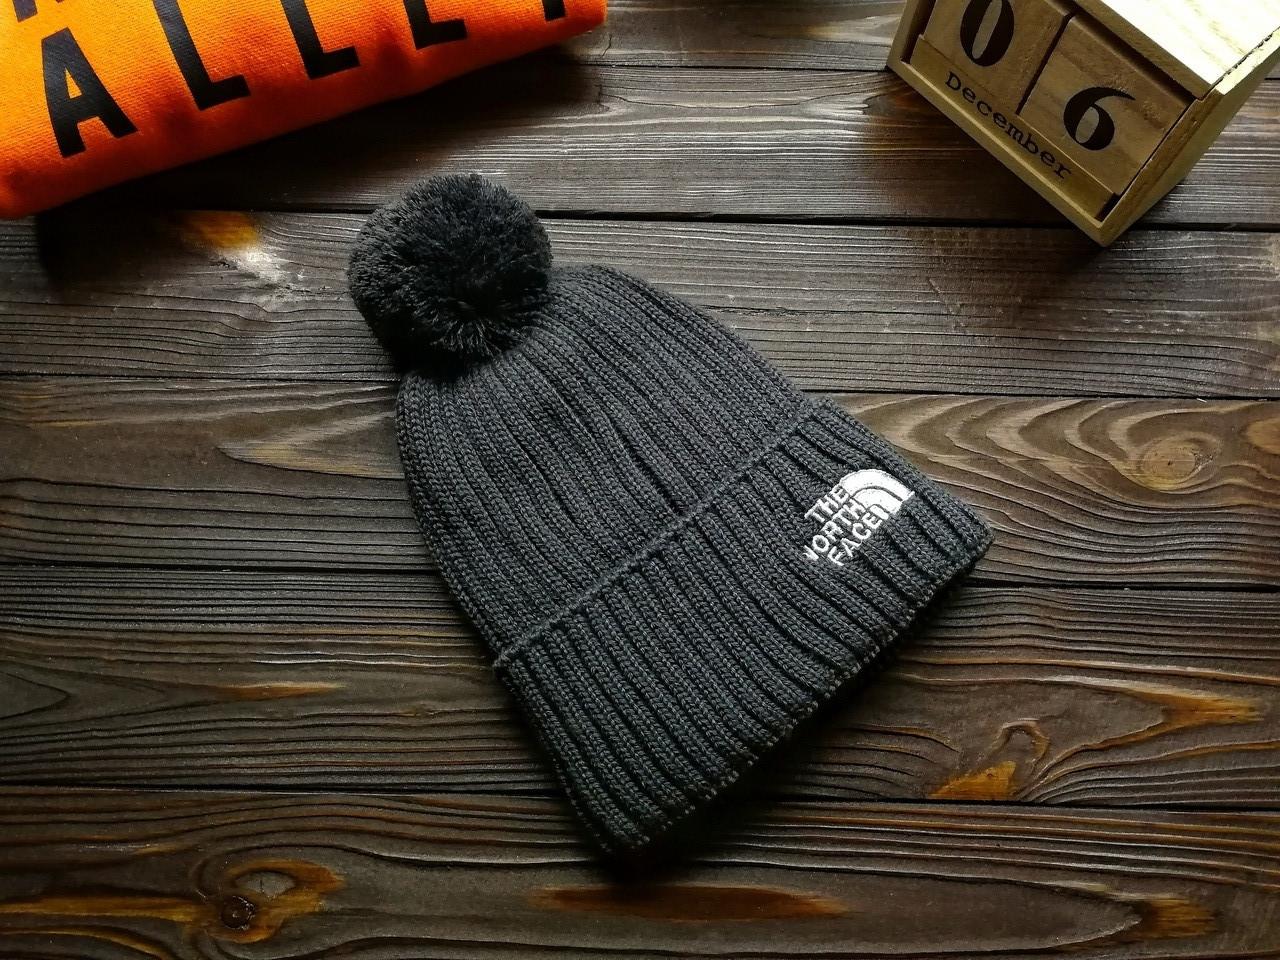 Шапка мужская The North Face серая с помпоном. Зимняя шапка мужская серого цвета с бубоном.